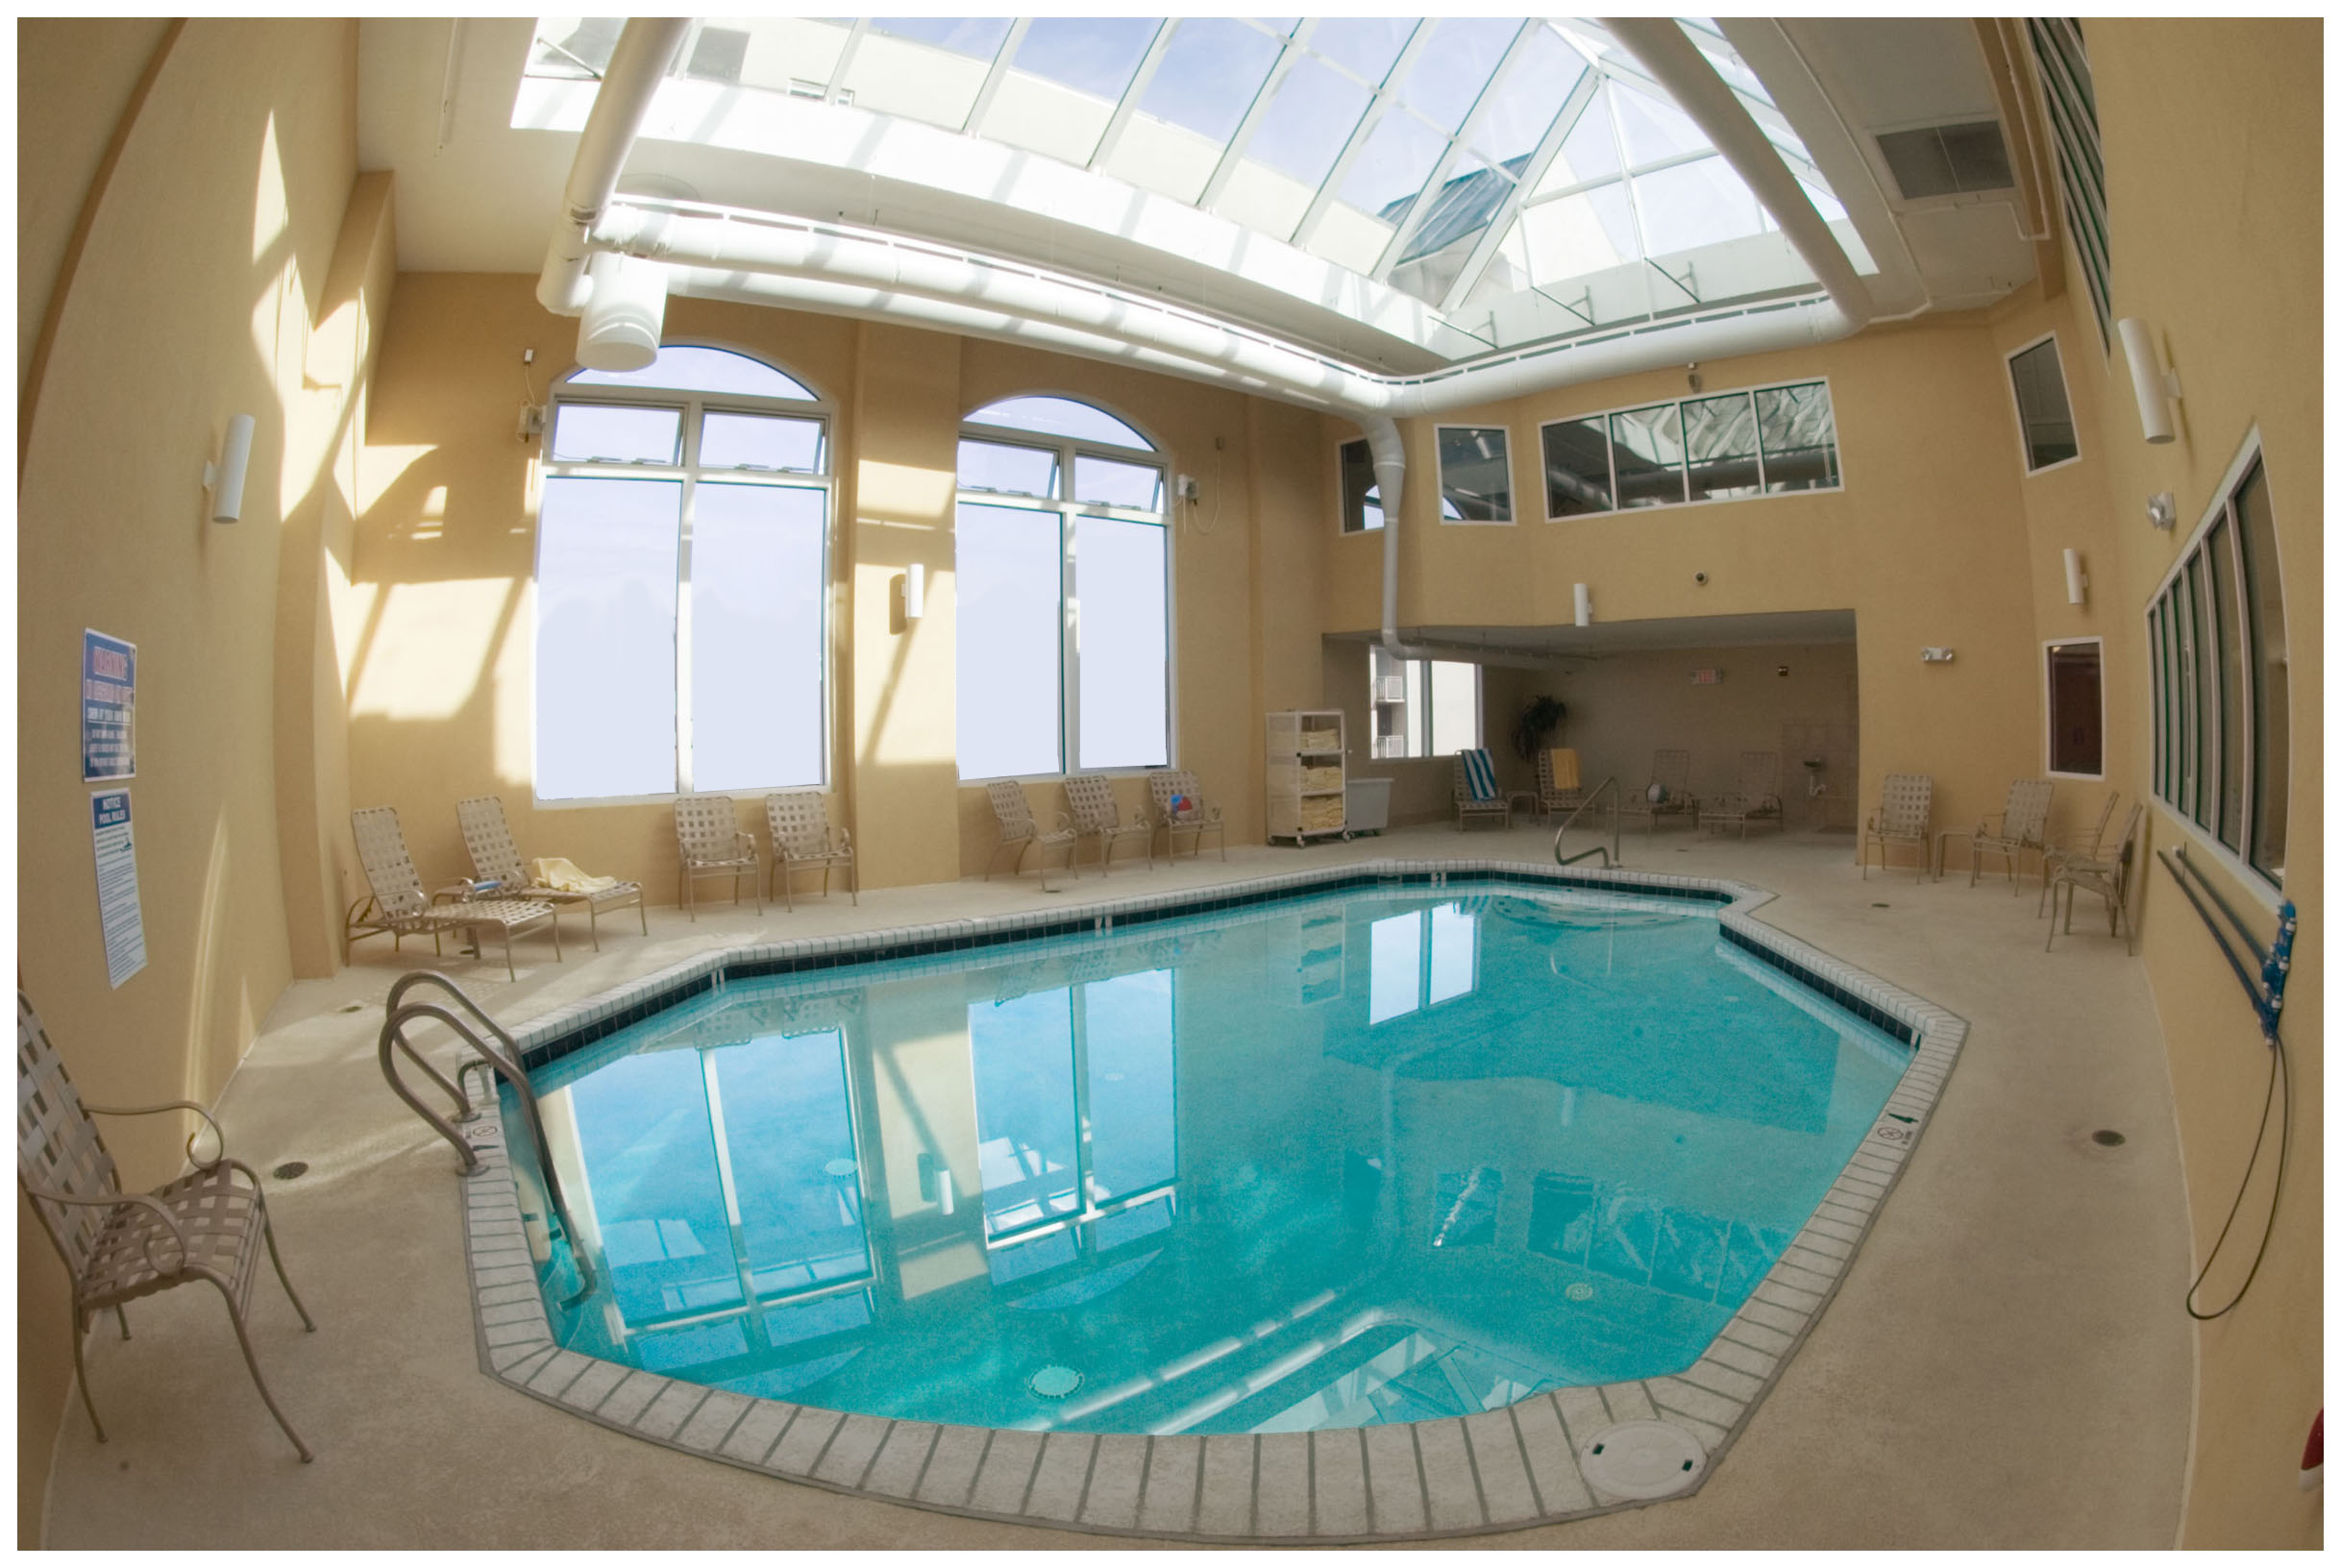 Breakers Hotel Indoor Pool In Ocean City Md On The Boardwalk